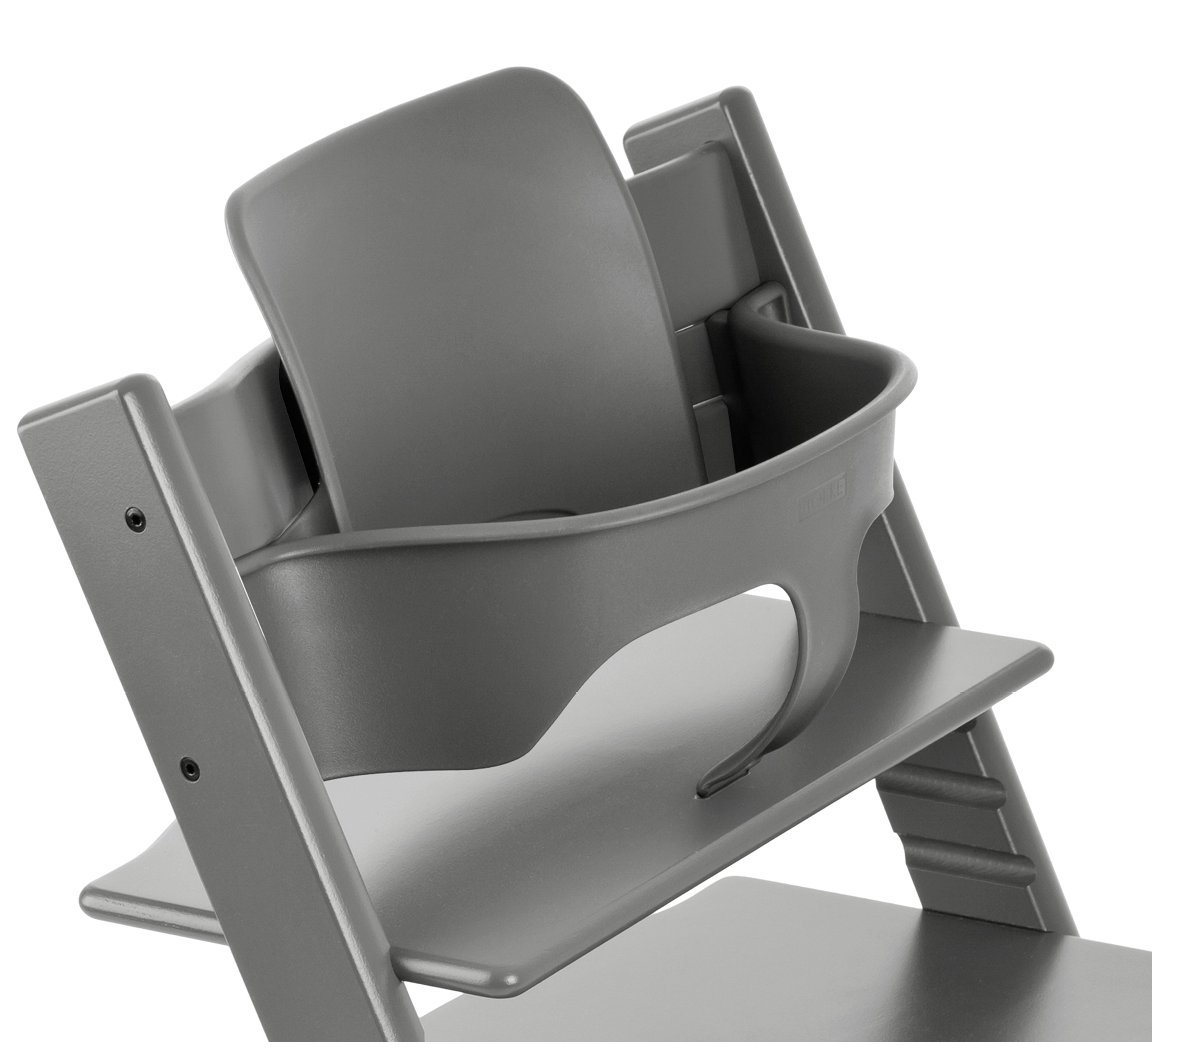 Stokke Tripp Trapp Chair Baby Set, No Harness, Storm Grey